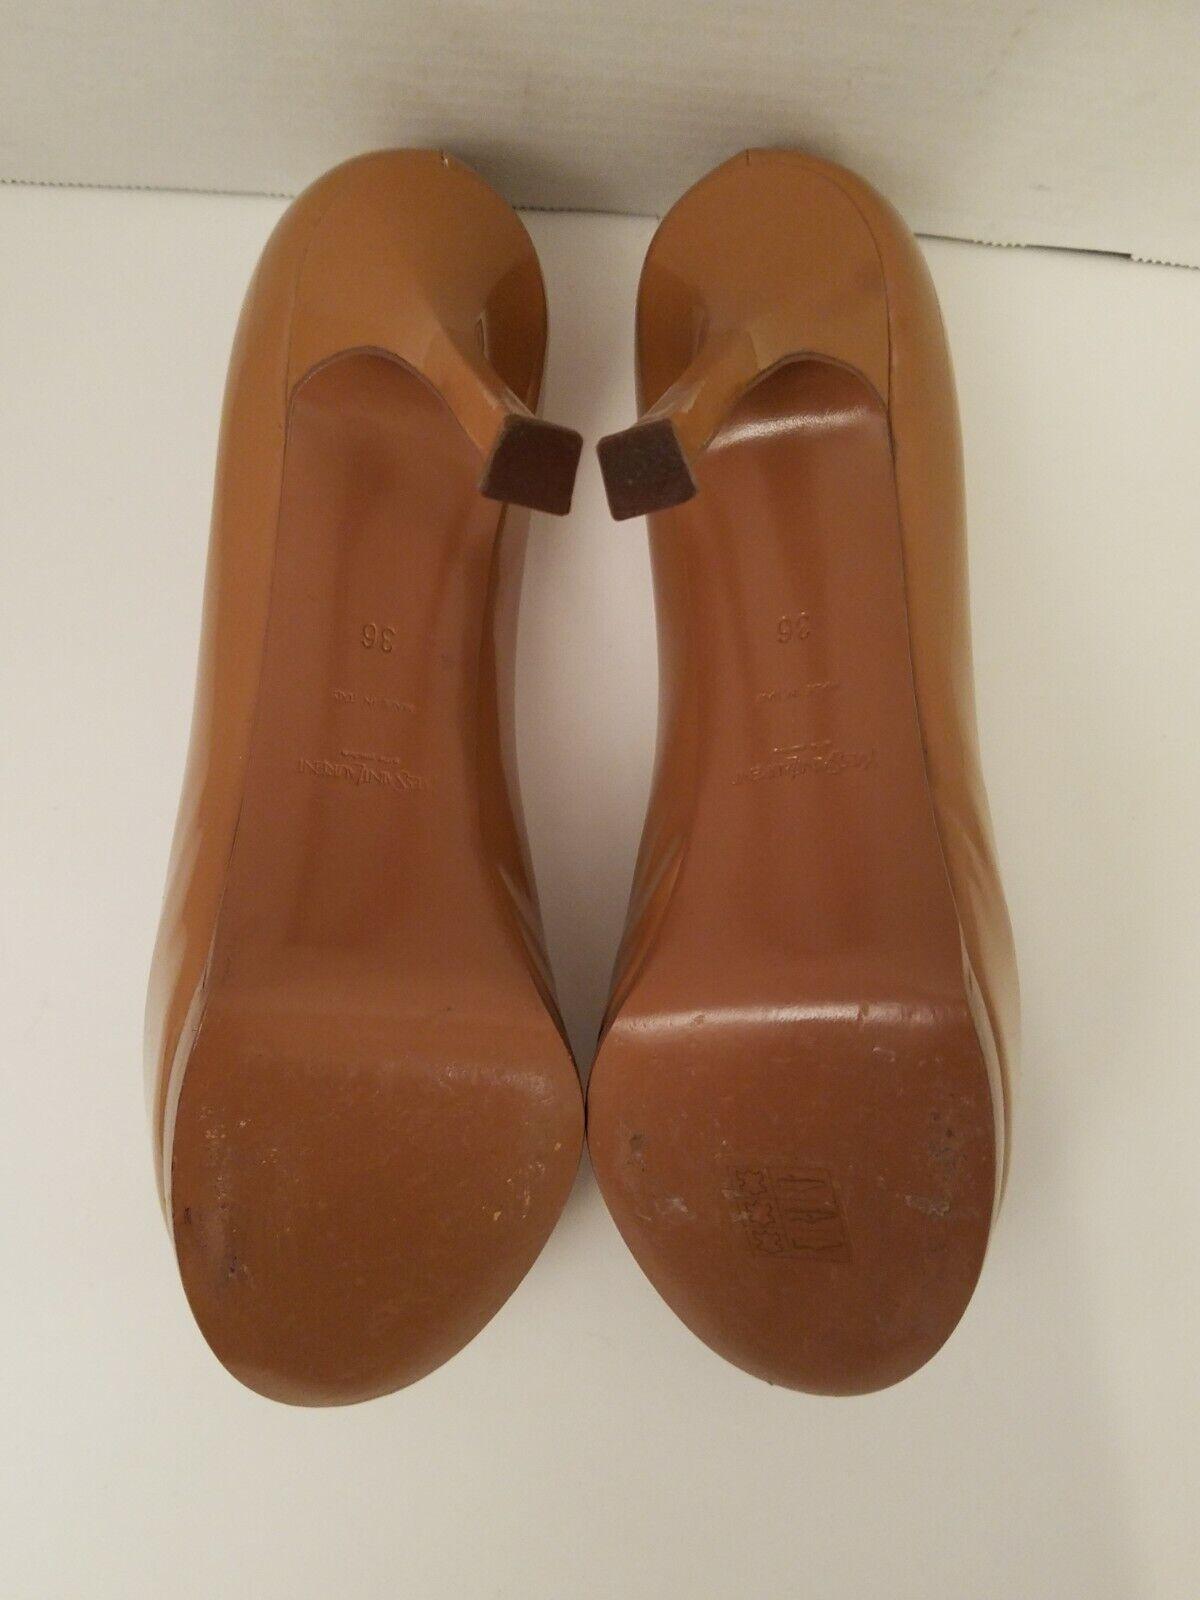 YSL Tribtoo Nude Patent Leather Platform Pumps 6/… - image 7